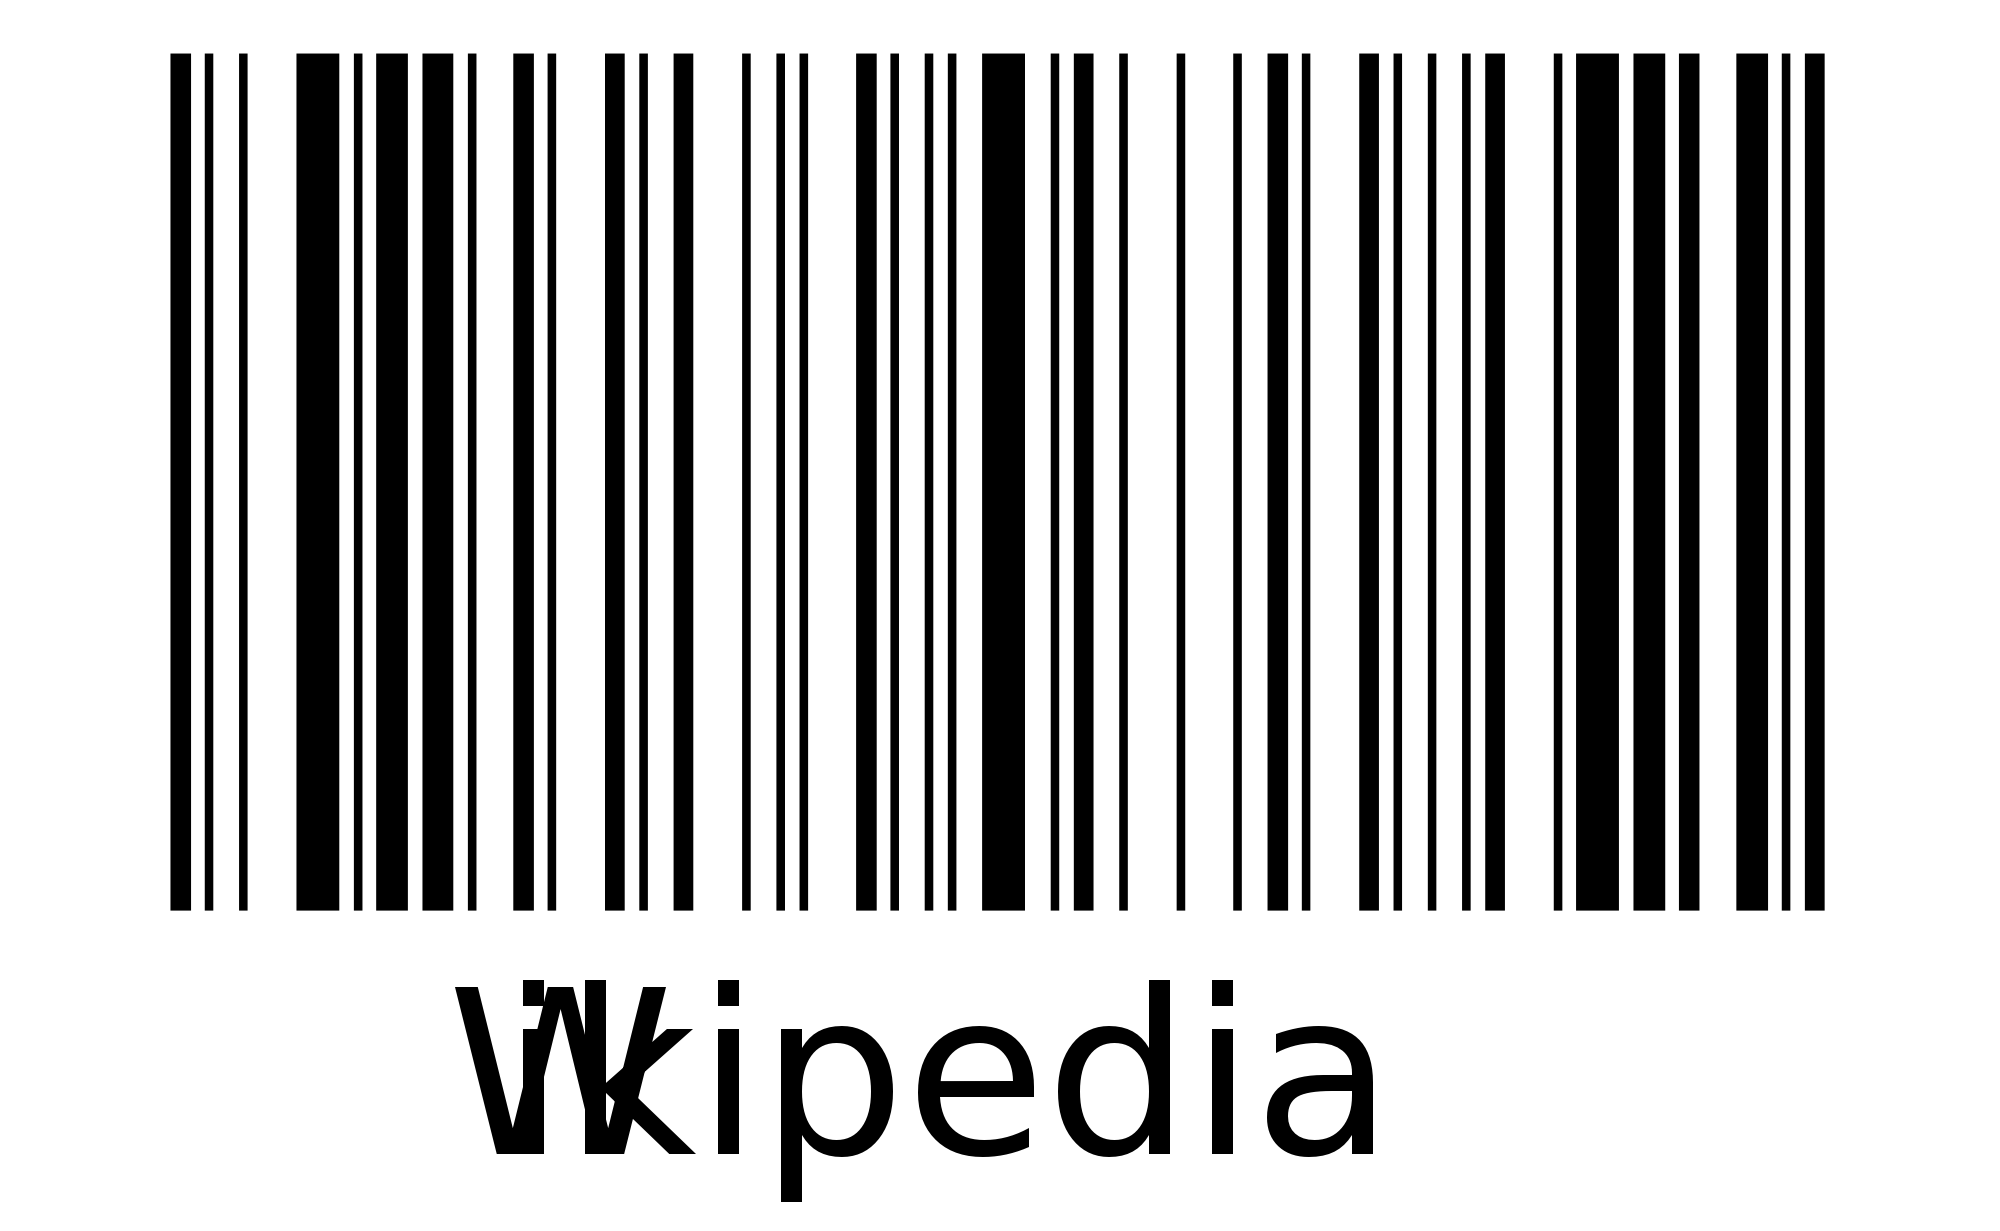 Magazine Barcode Vector